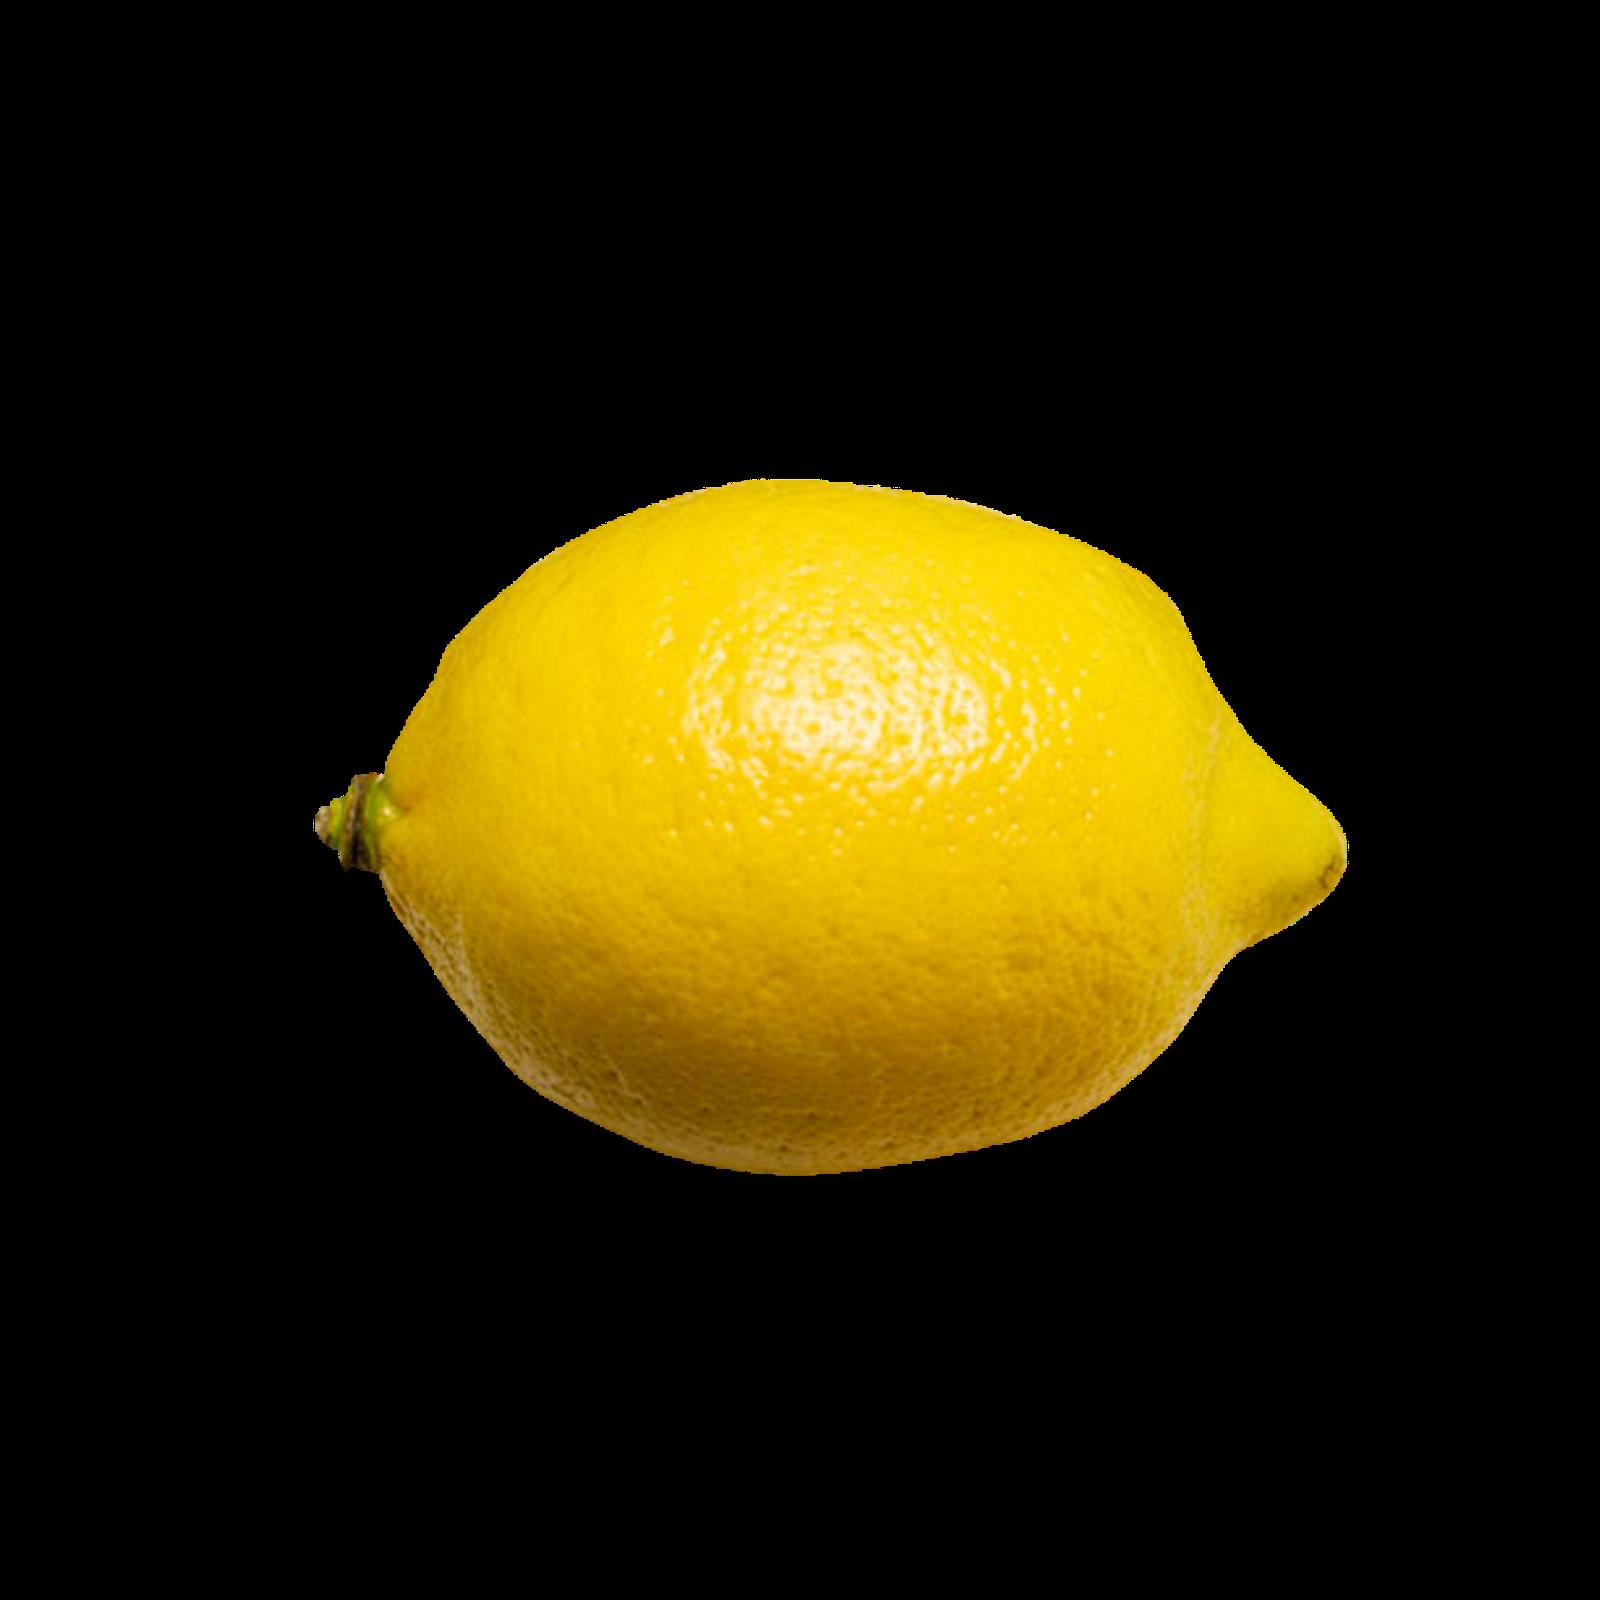 Lemon PNG Image.